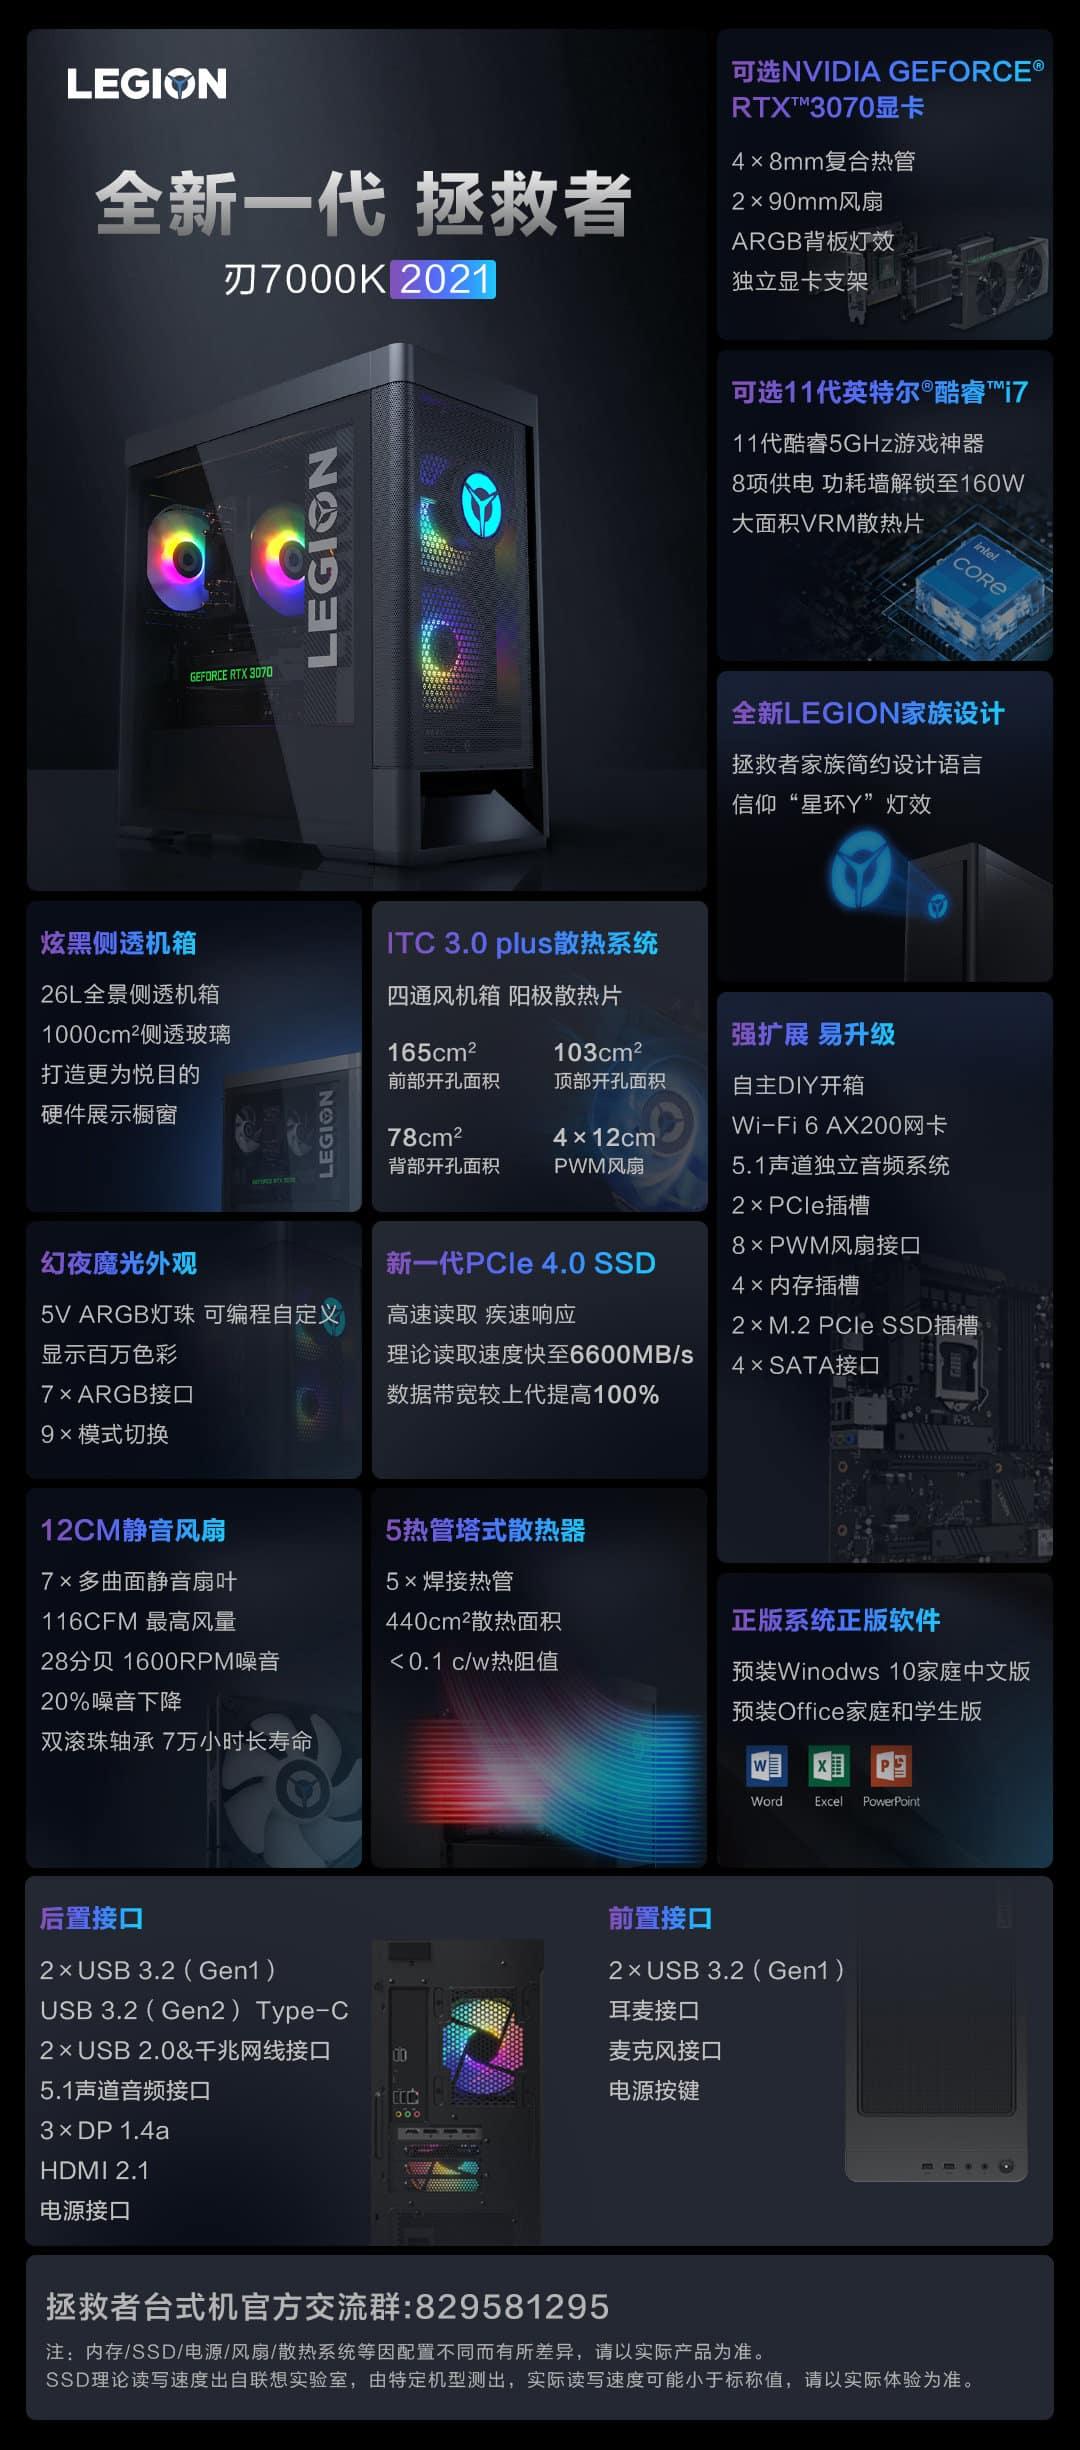 Lenovo Savior Blade 7000K/9000K 2021 Gaming Desktops launched in China, starts at $1,302